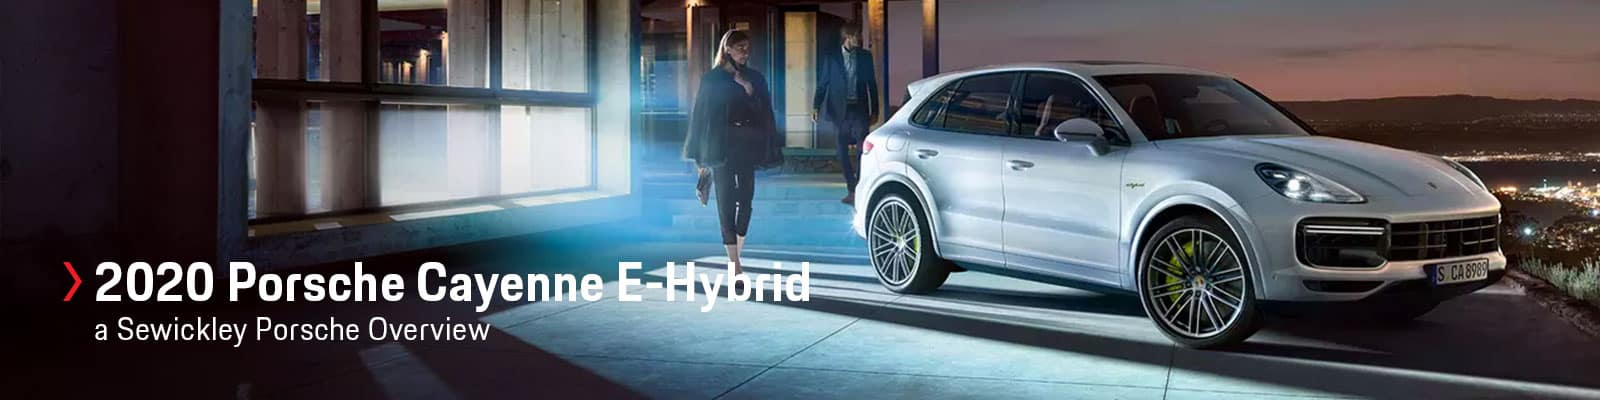 2020 Porsche Cayenne E-Hybrid Model Review at Sewickley Porsche